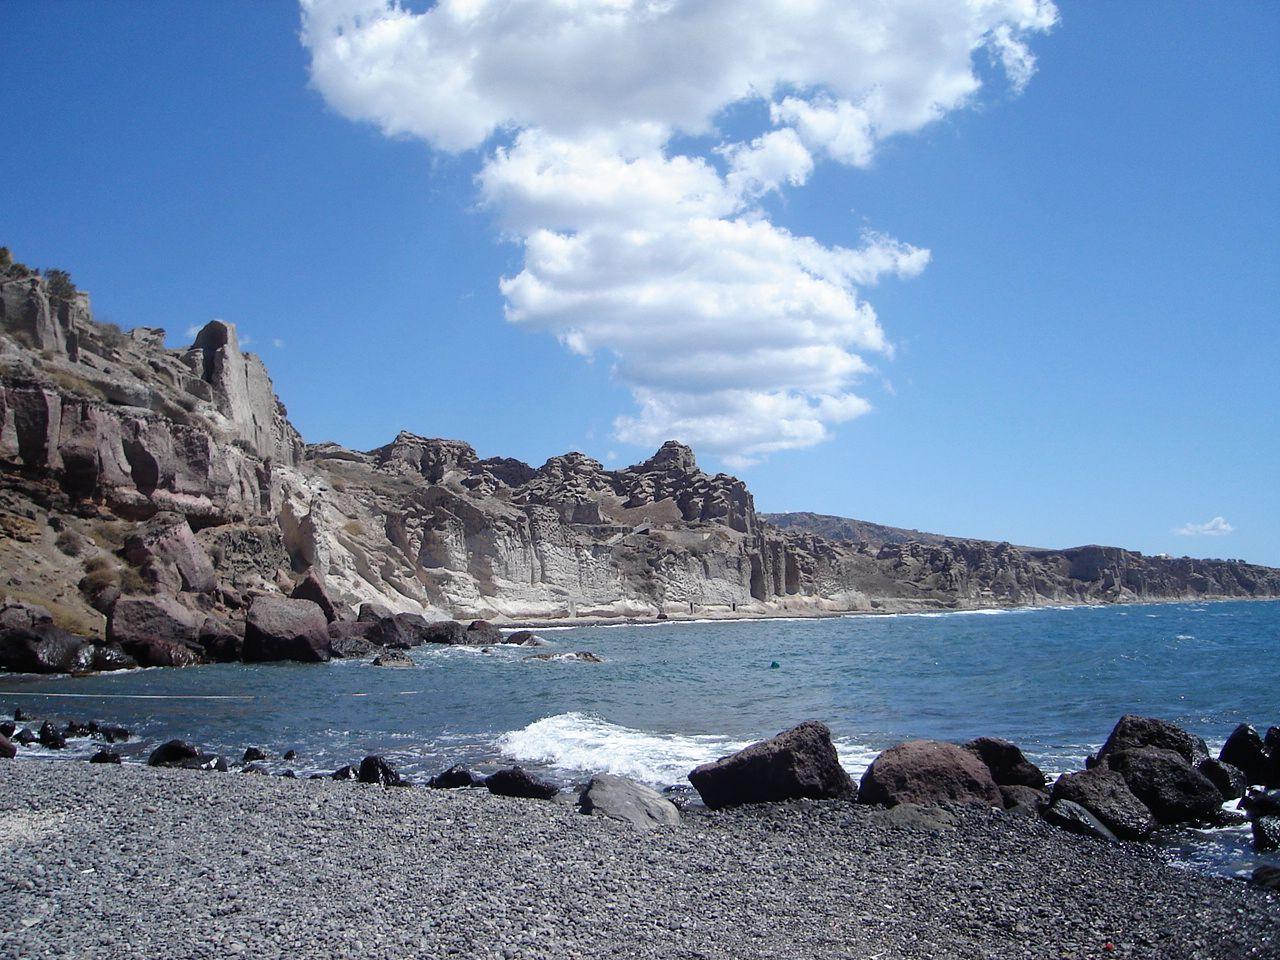 Tutte le Nuvole Qui-almira-beach-2.jpg